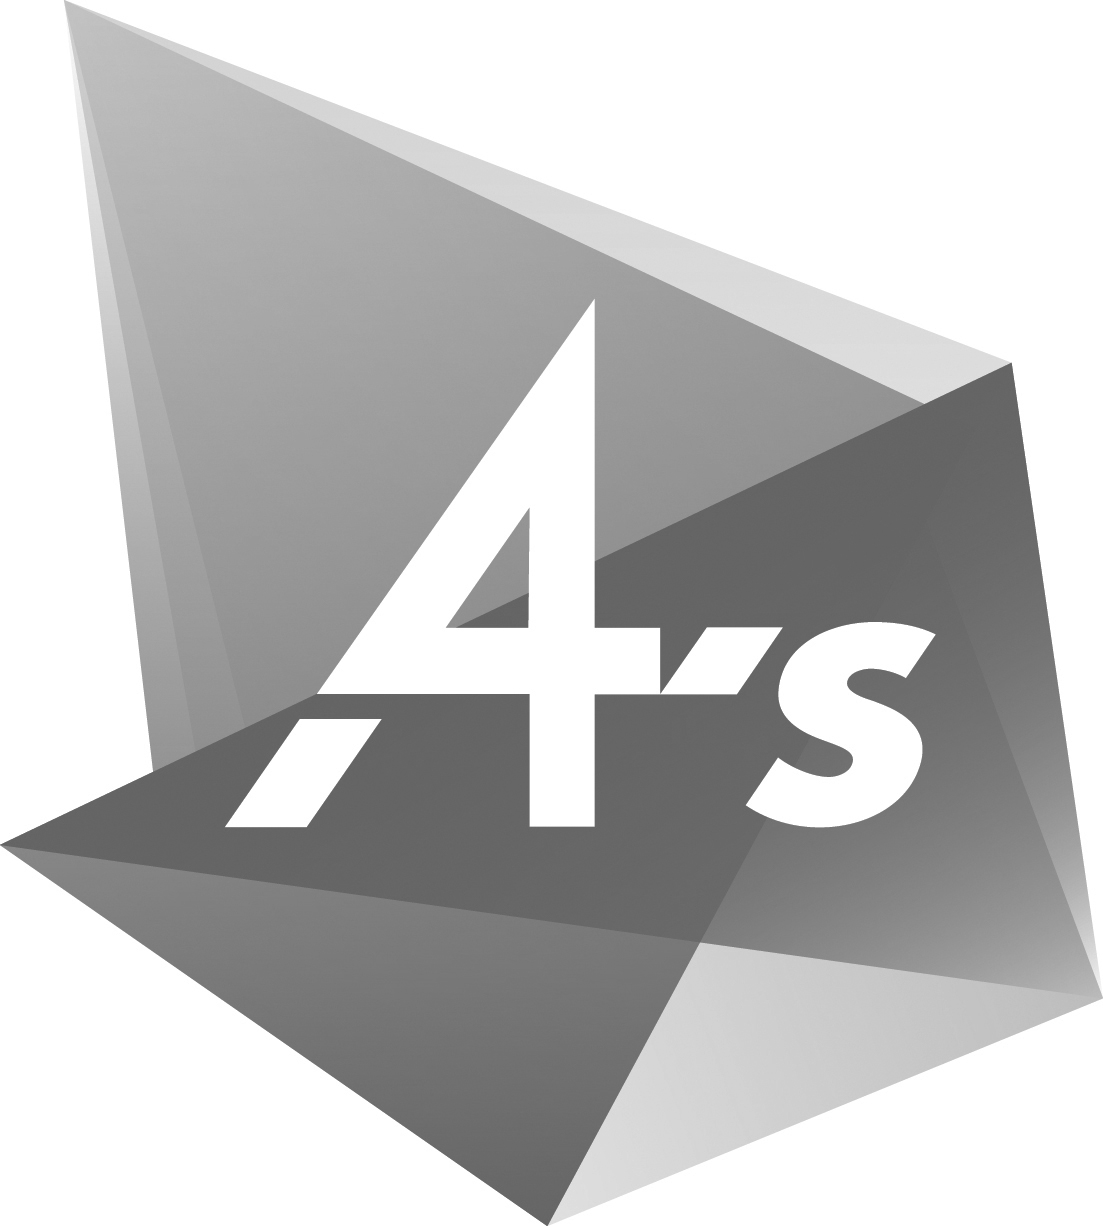 4As-Logo.jpg